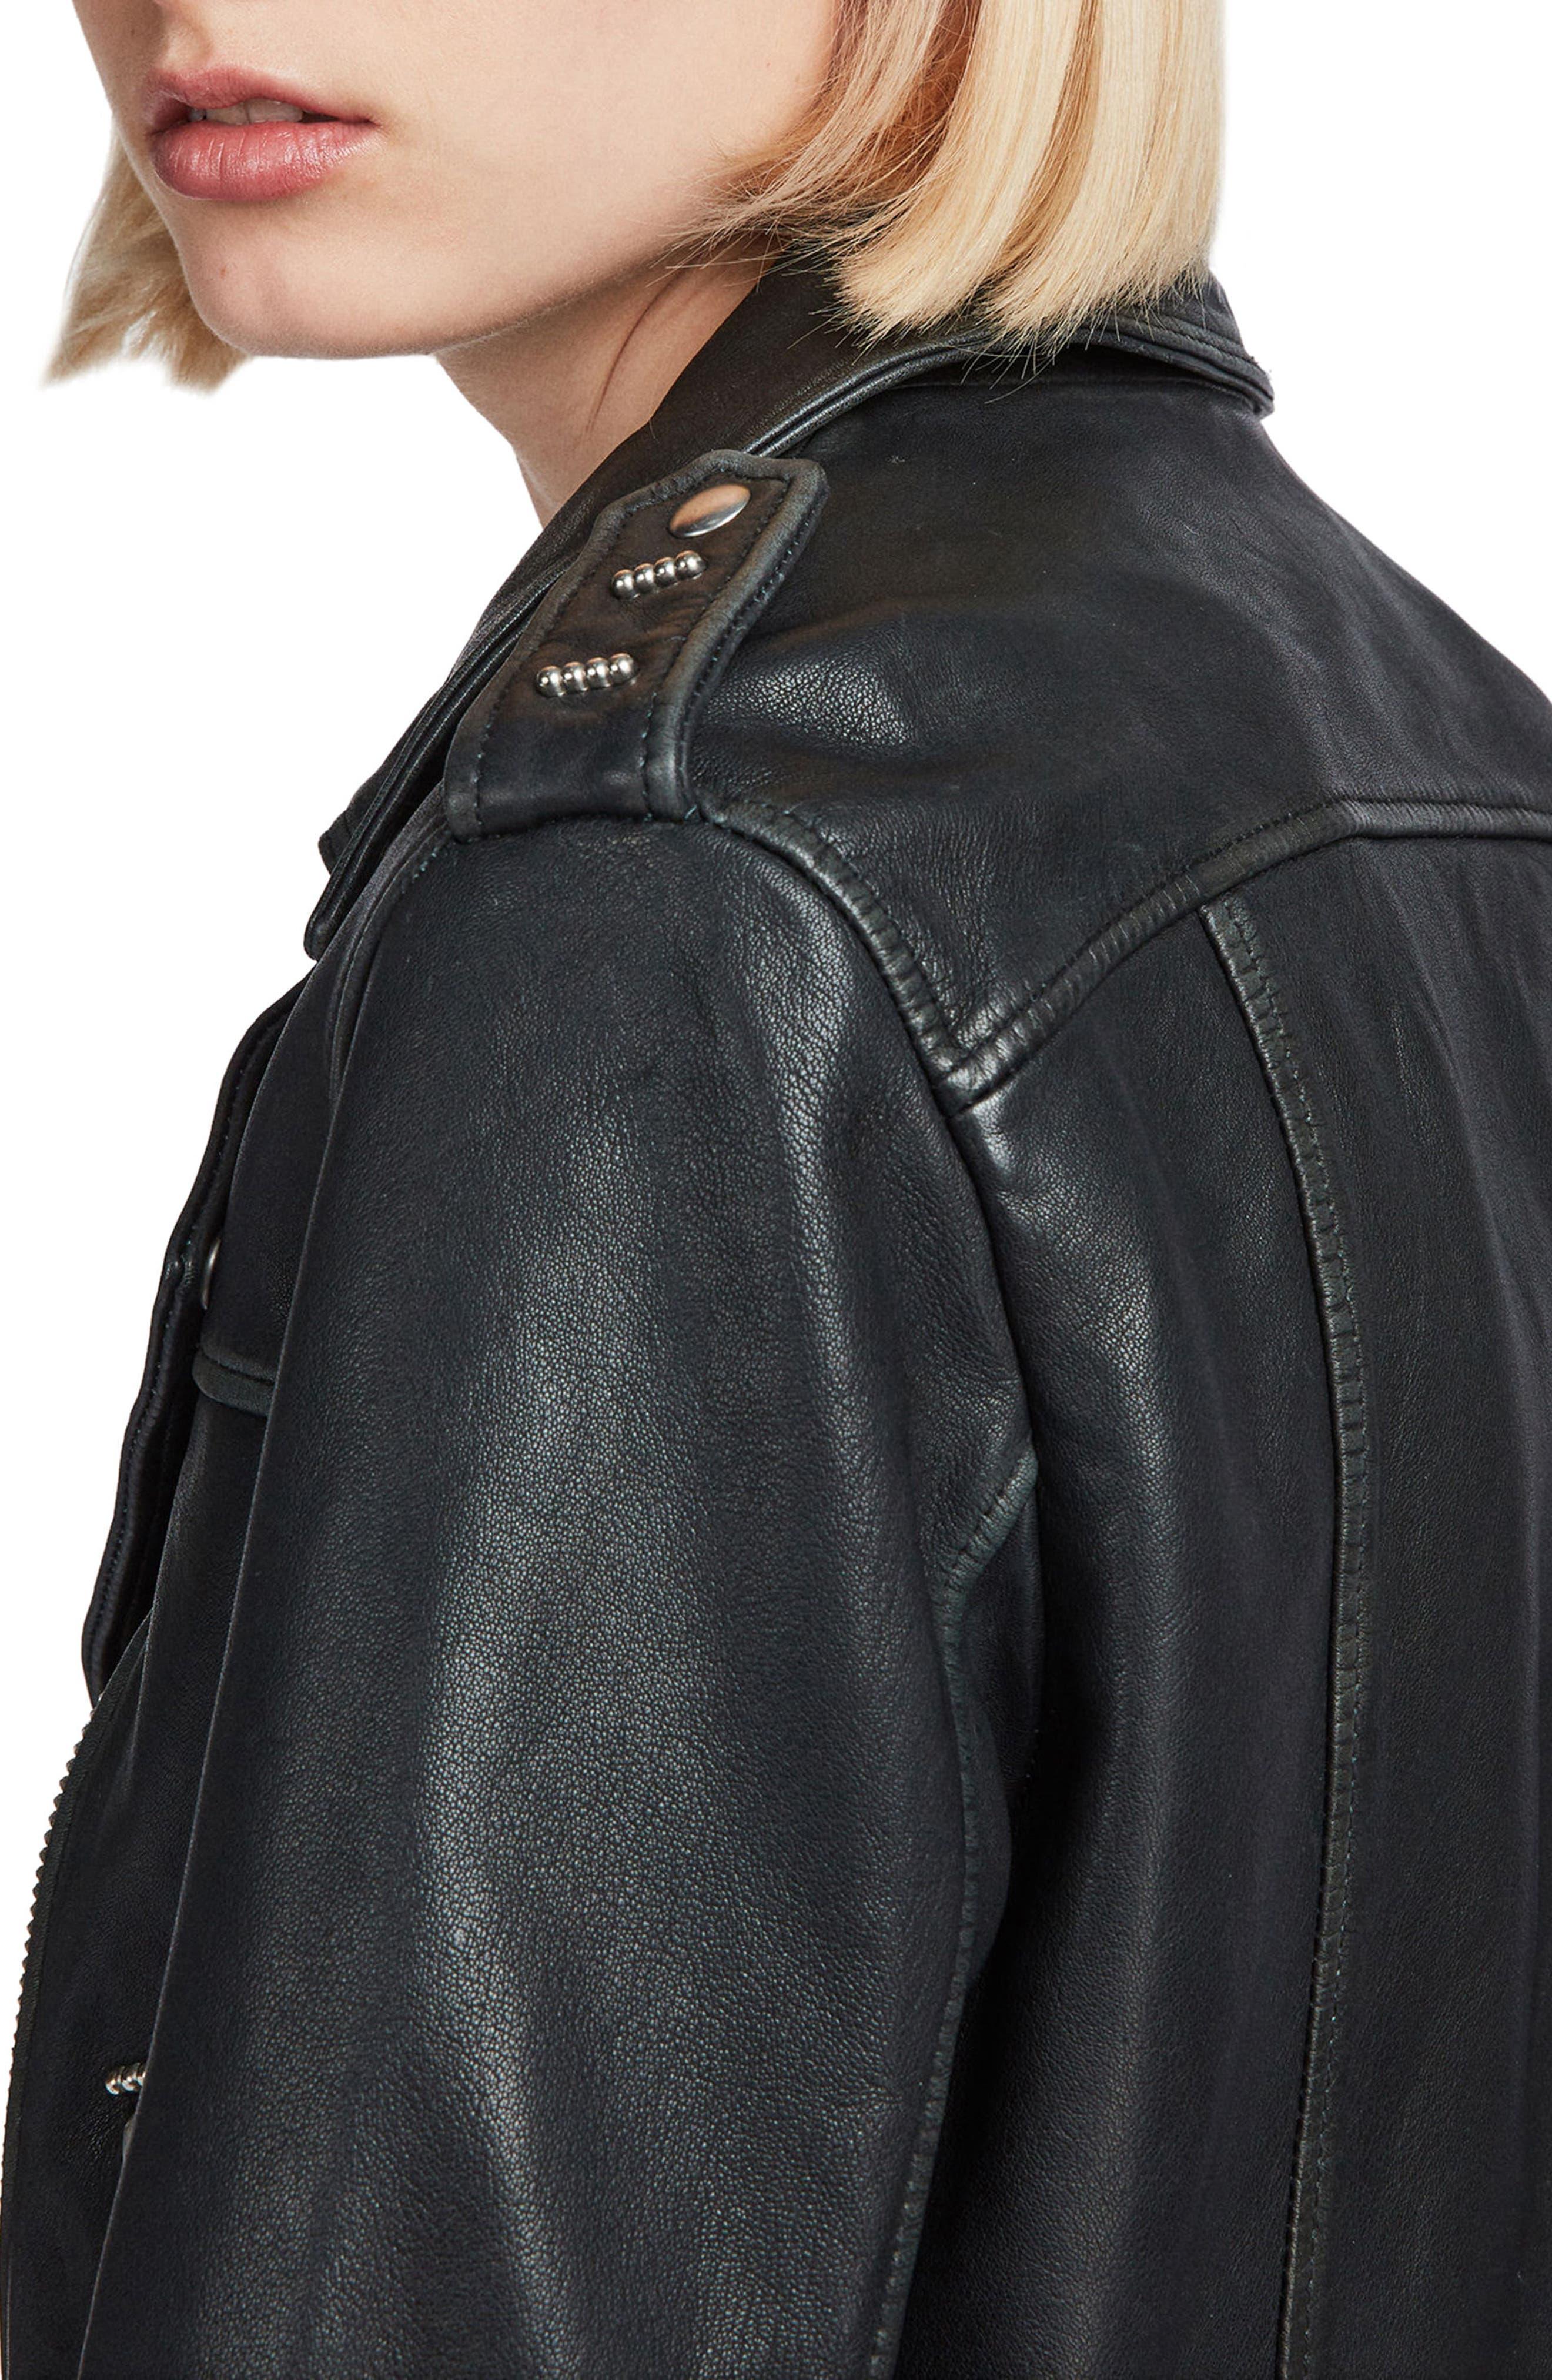 Lara Sheepskin Leather Biker Jacket,                             Alternate thumbnail 4, color,                             001